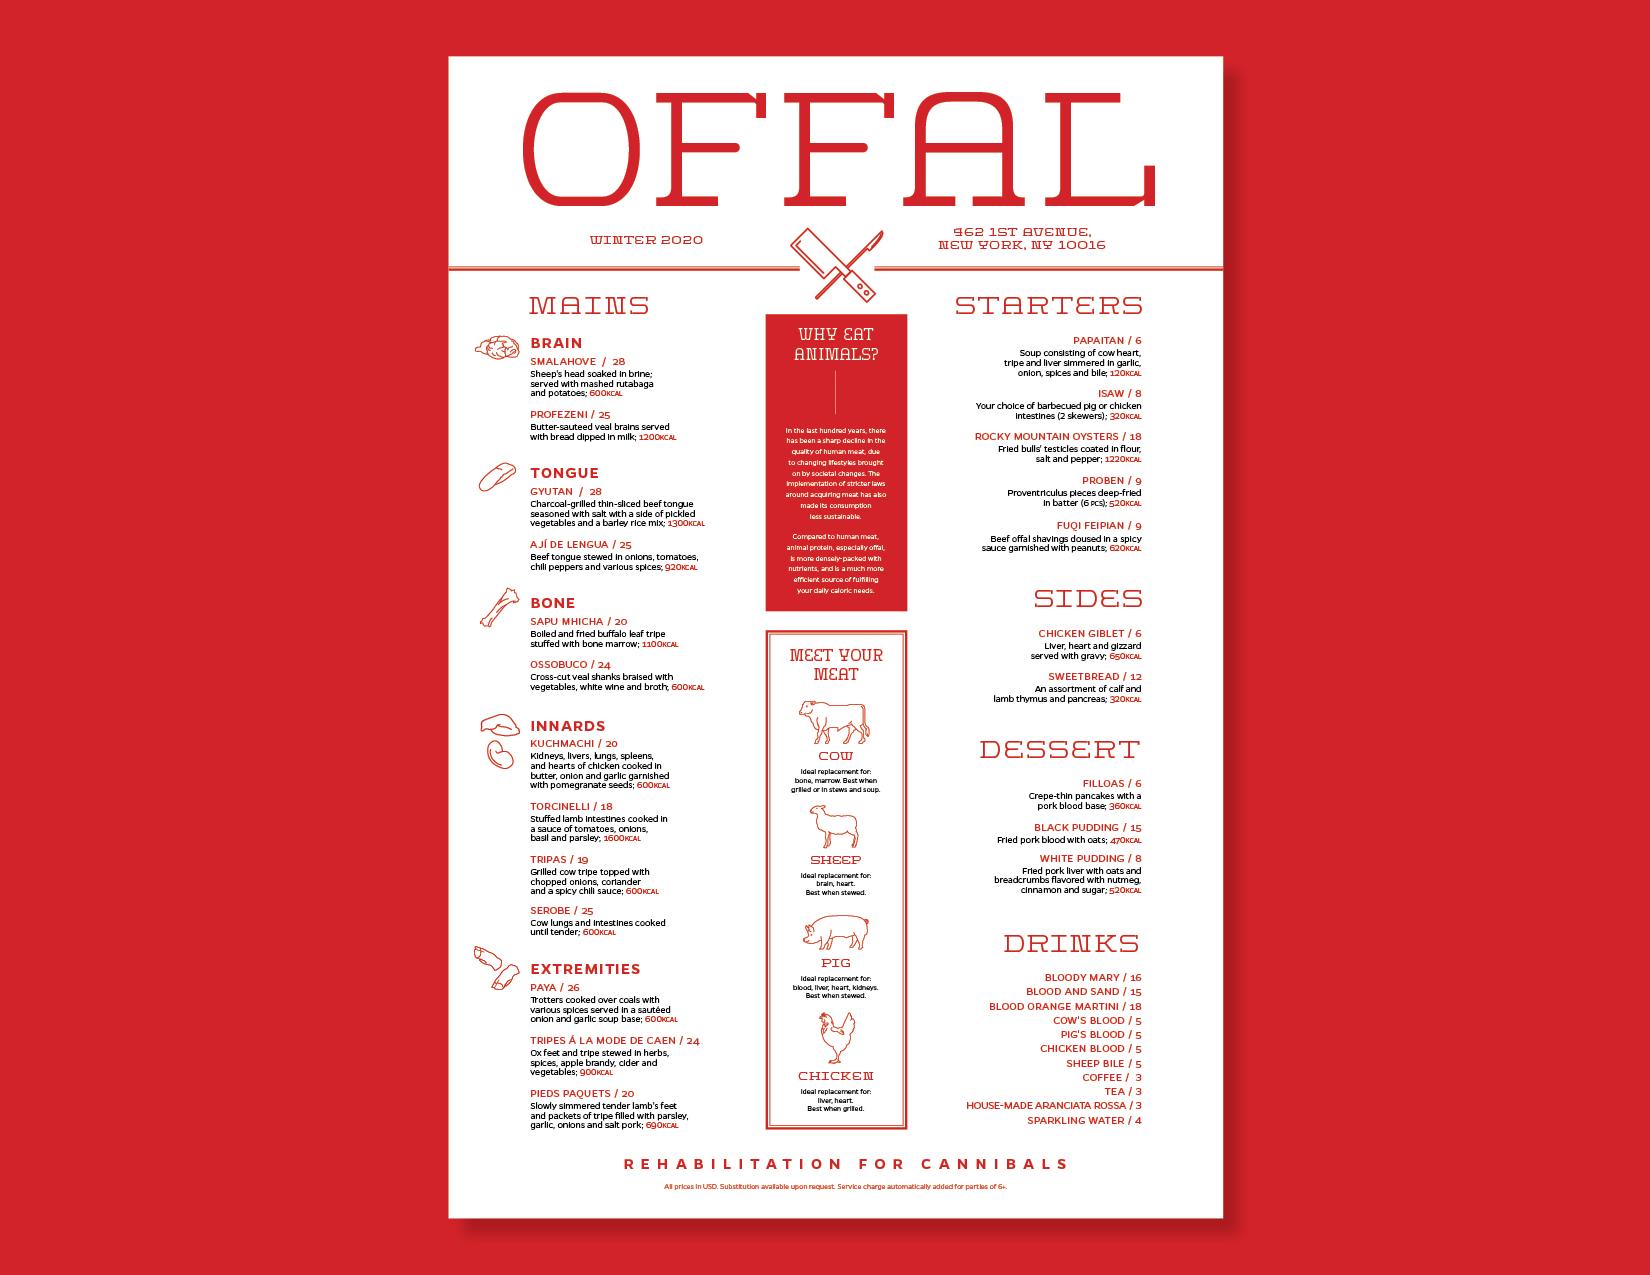 Offal_BrandBook_v2_bigmenu